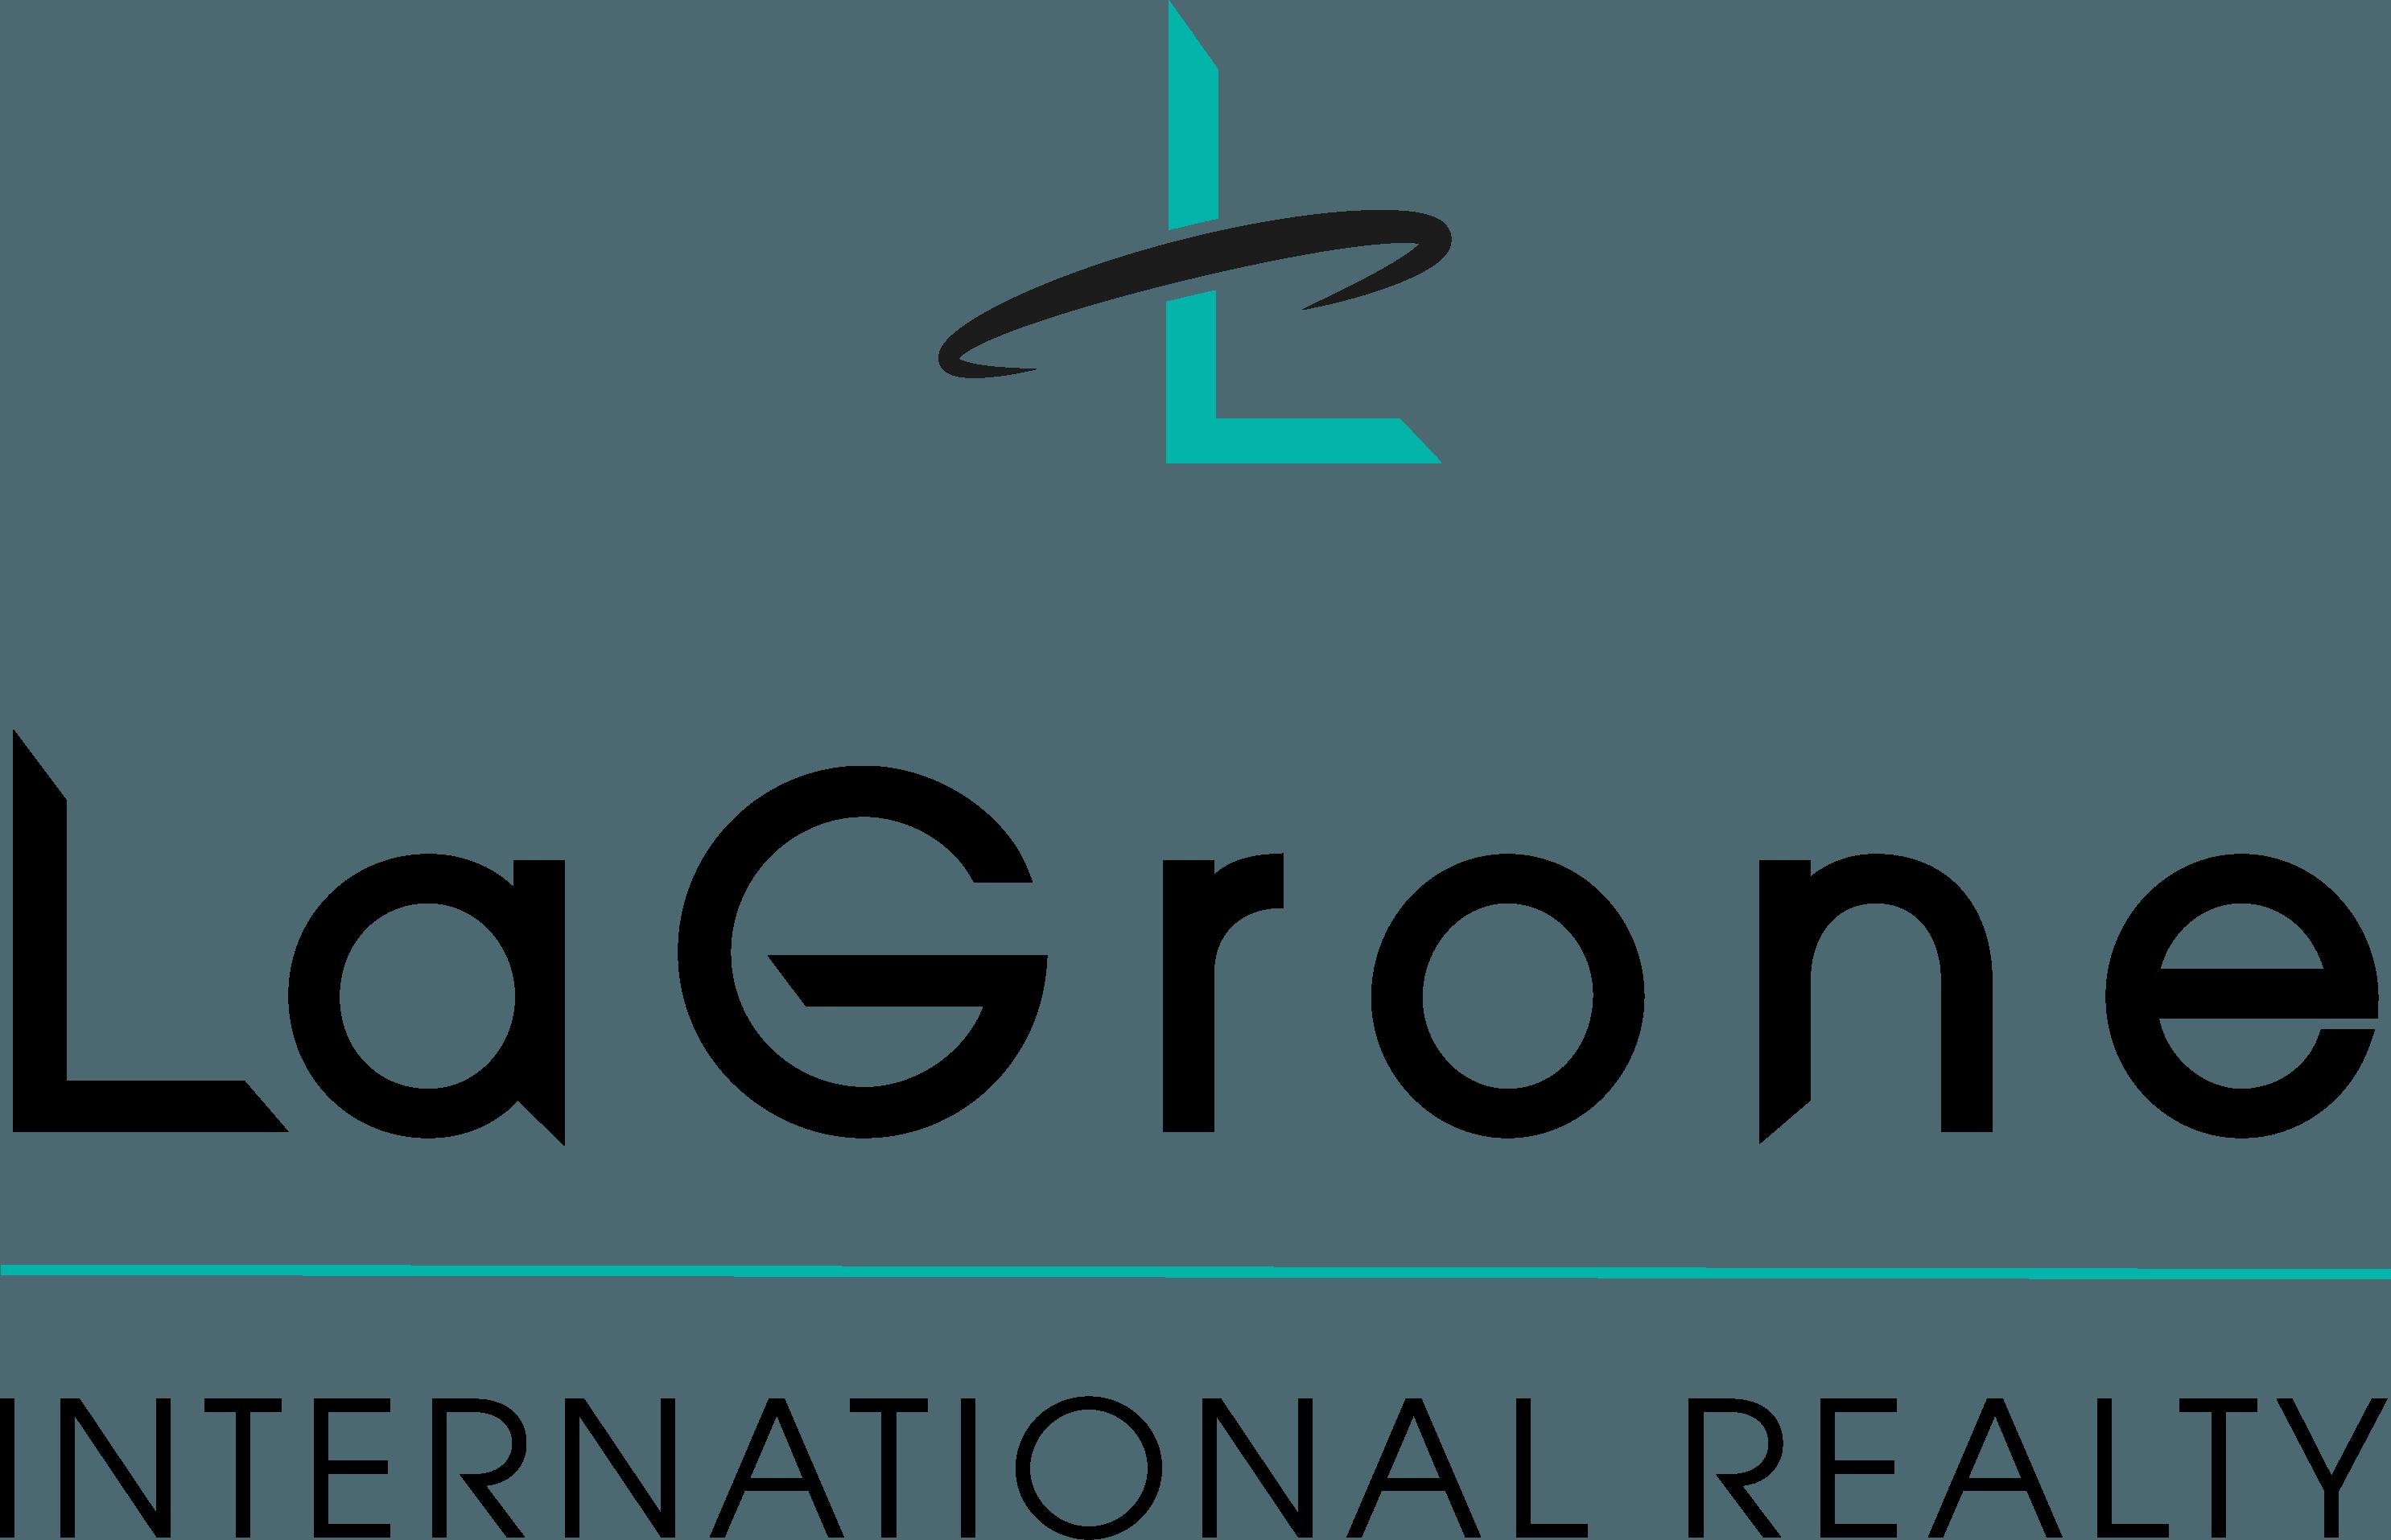 LaGrone International Realty logo